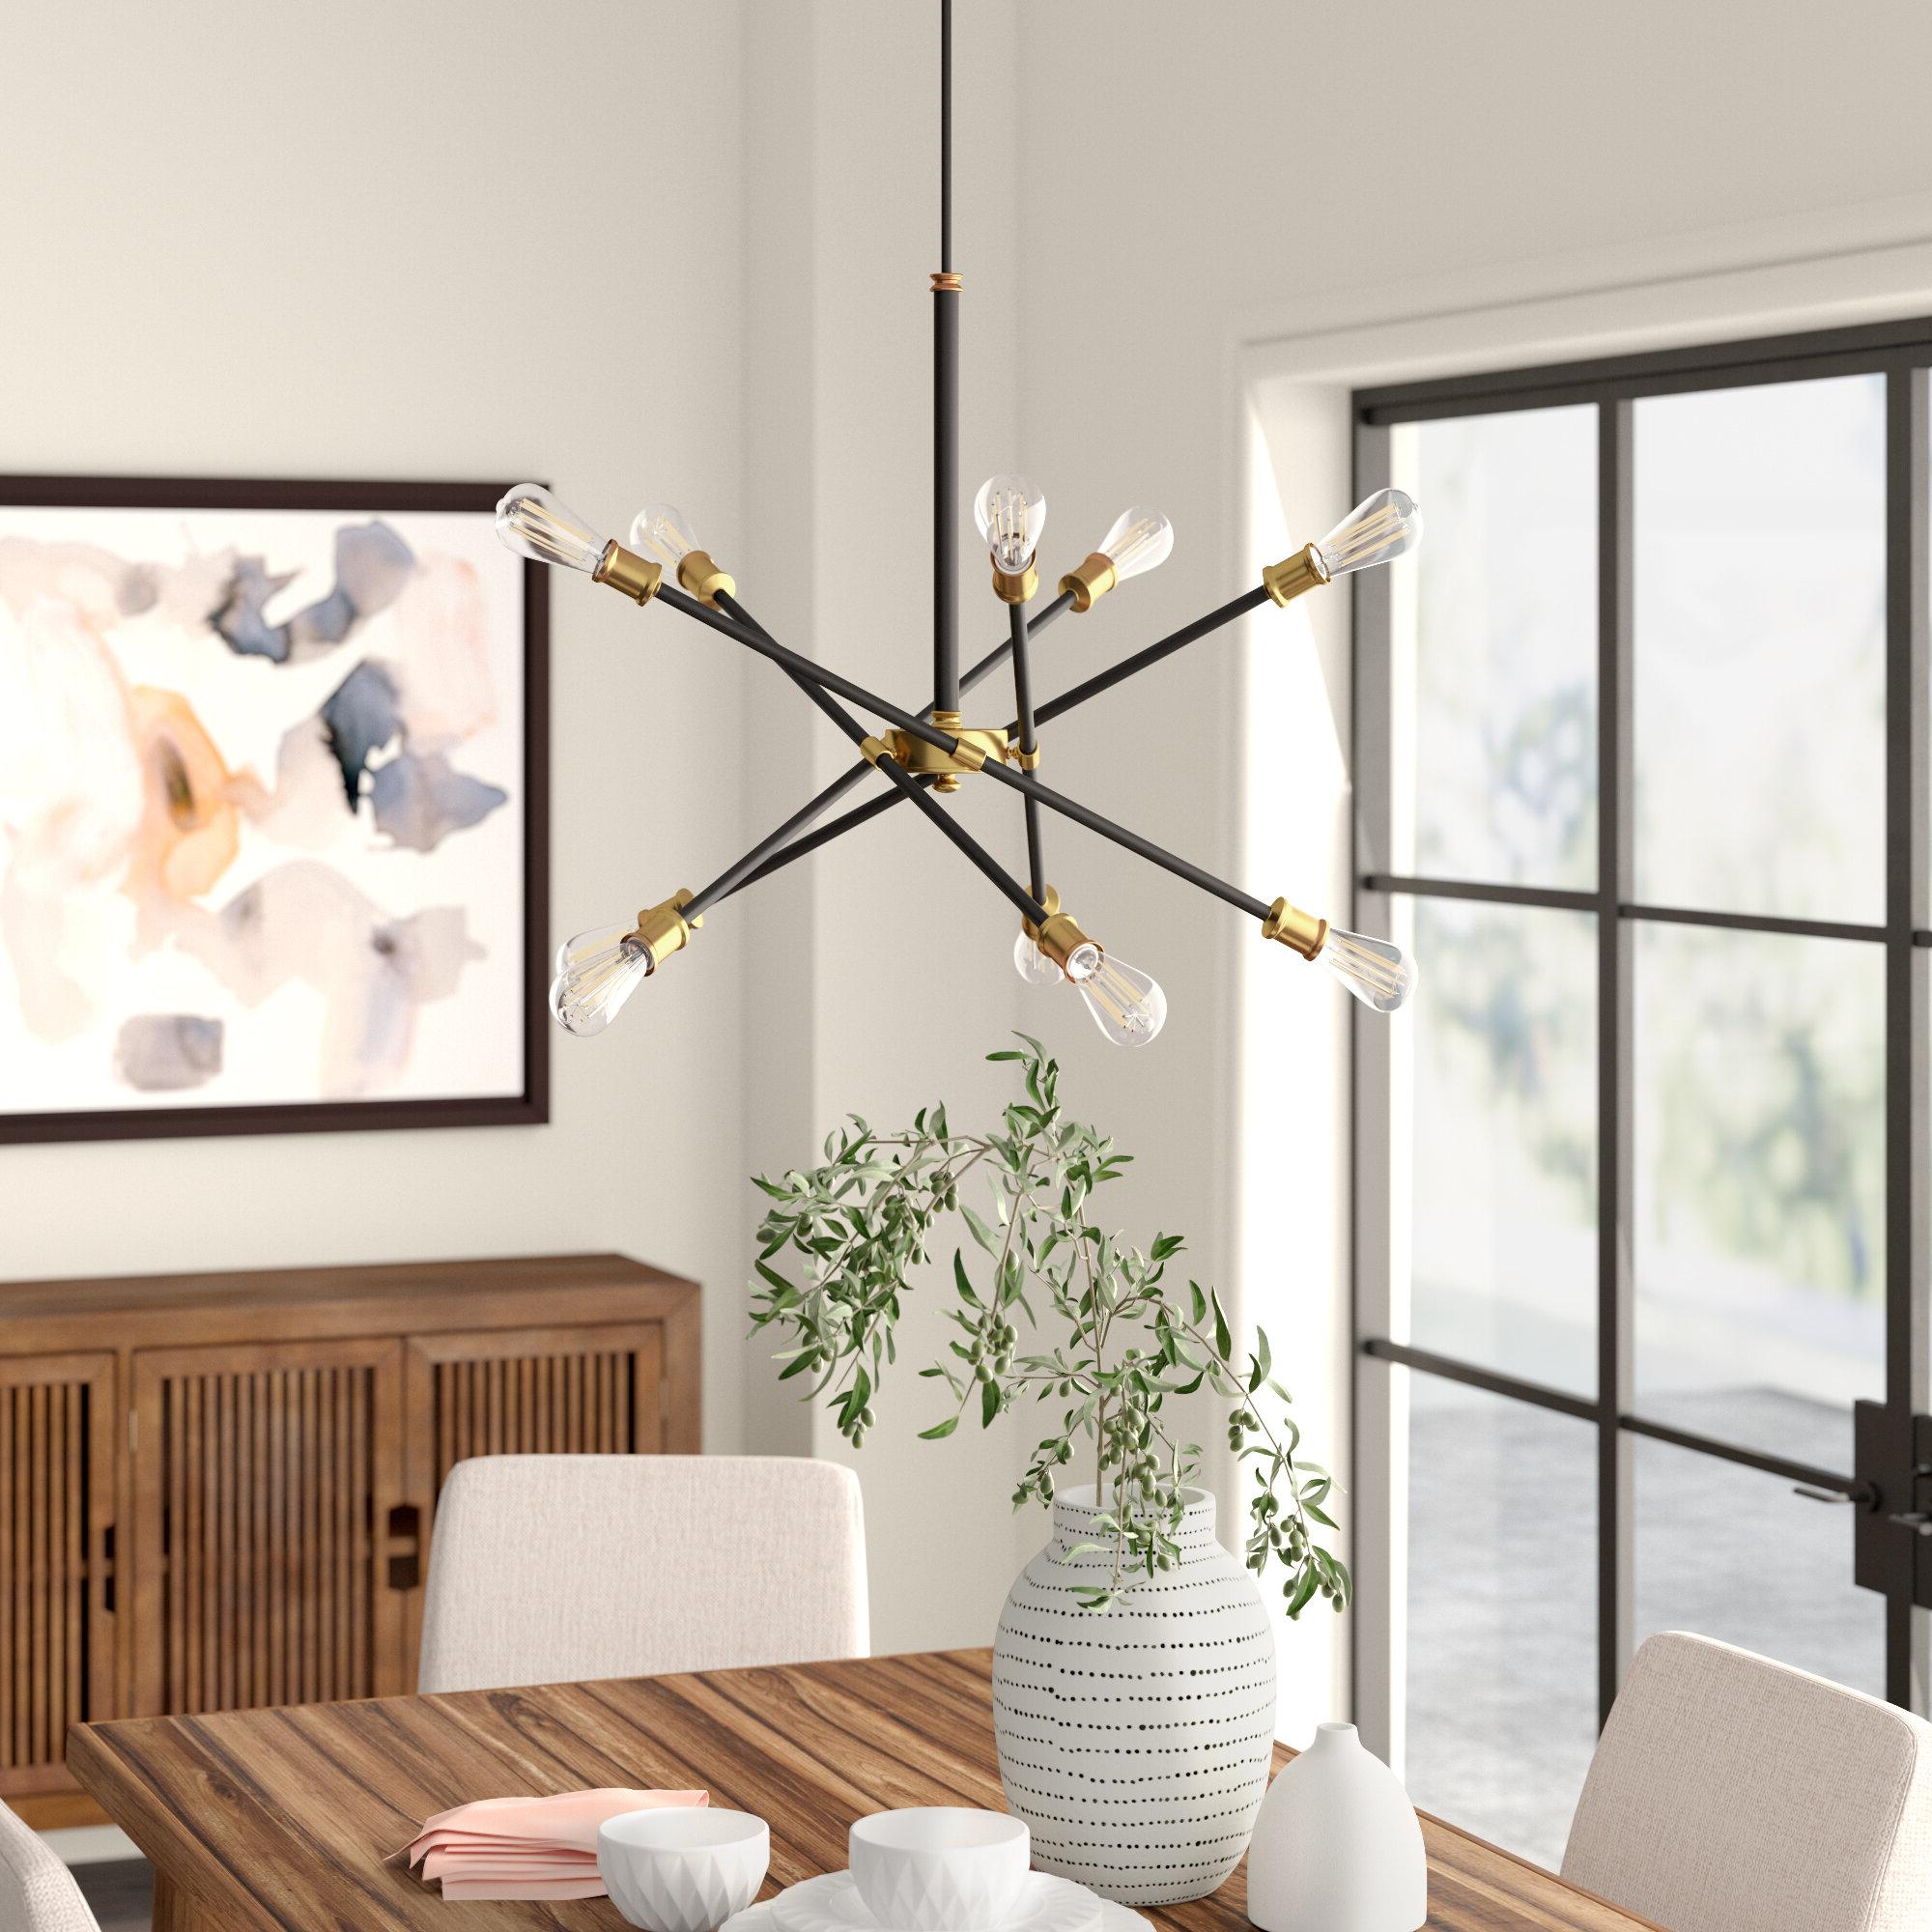 Favorite Everett 10 Light Sputnik Chandeliers Inside Everett 10 Light Sputnik Chandelier (View 3 of 20)